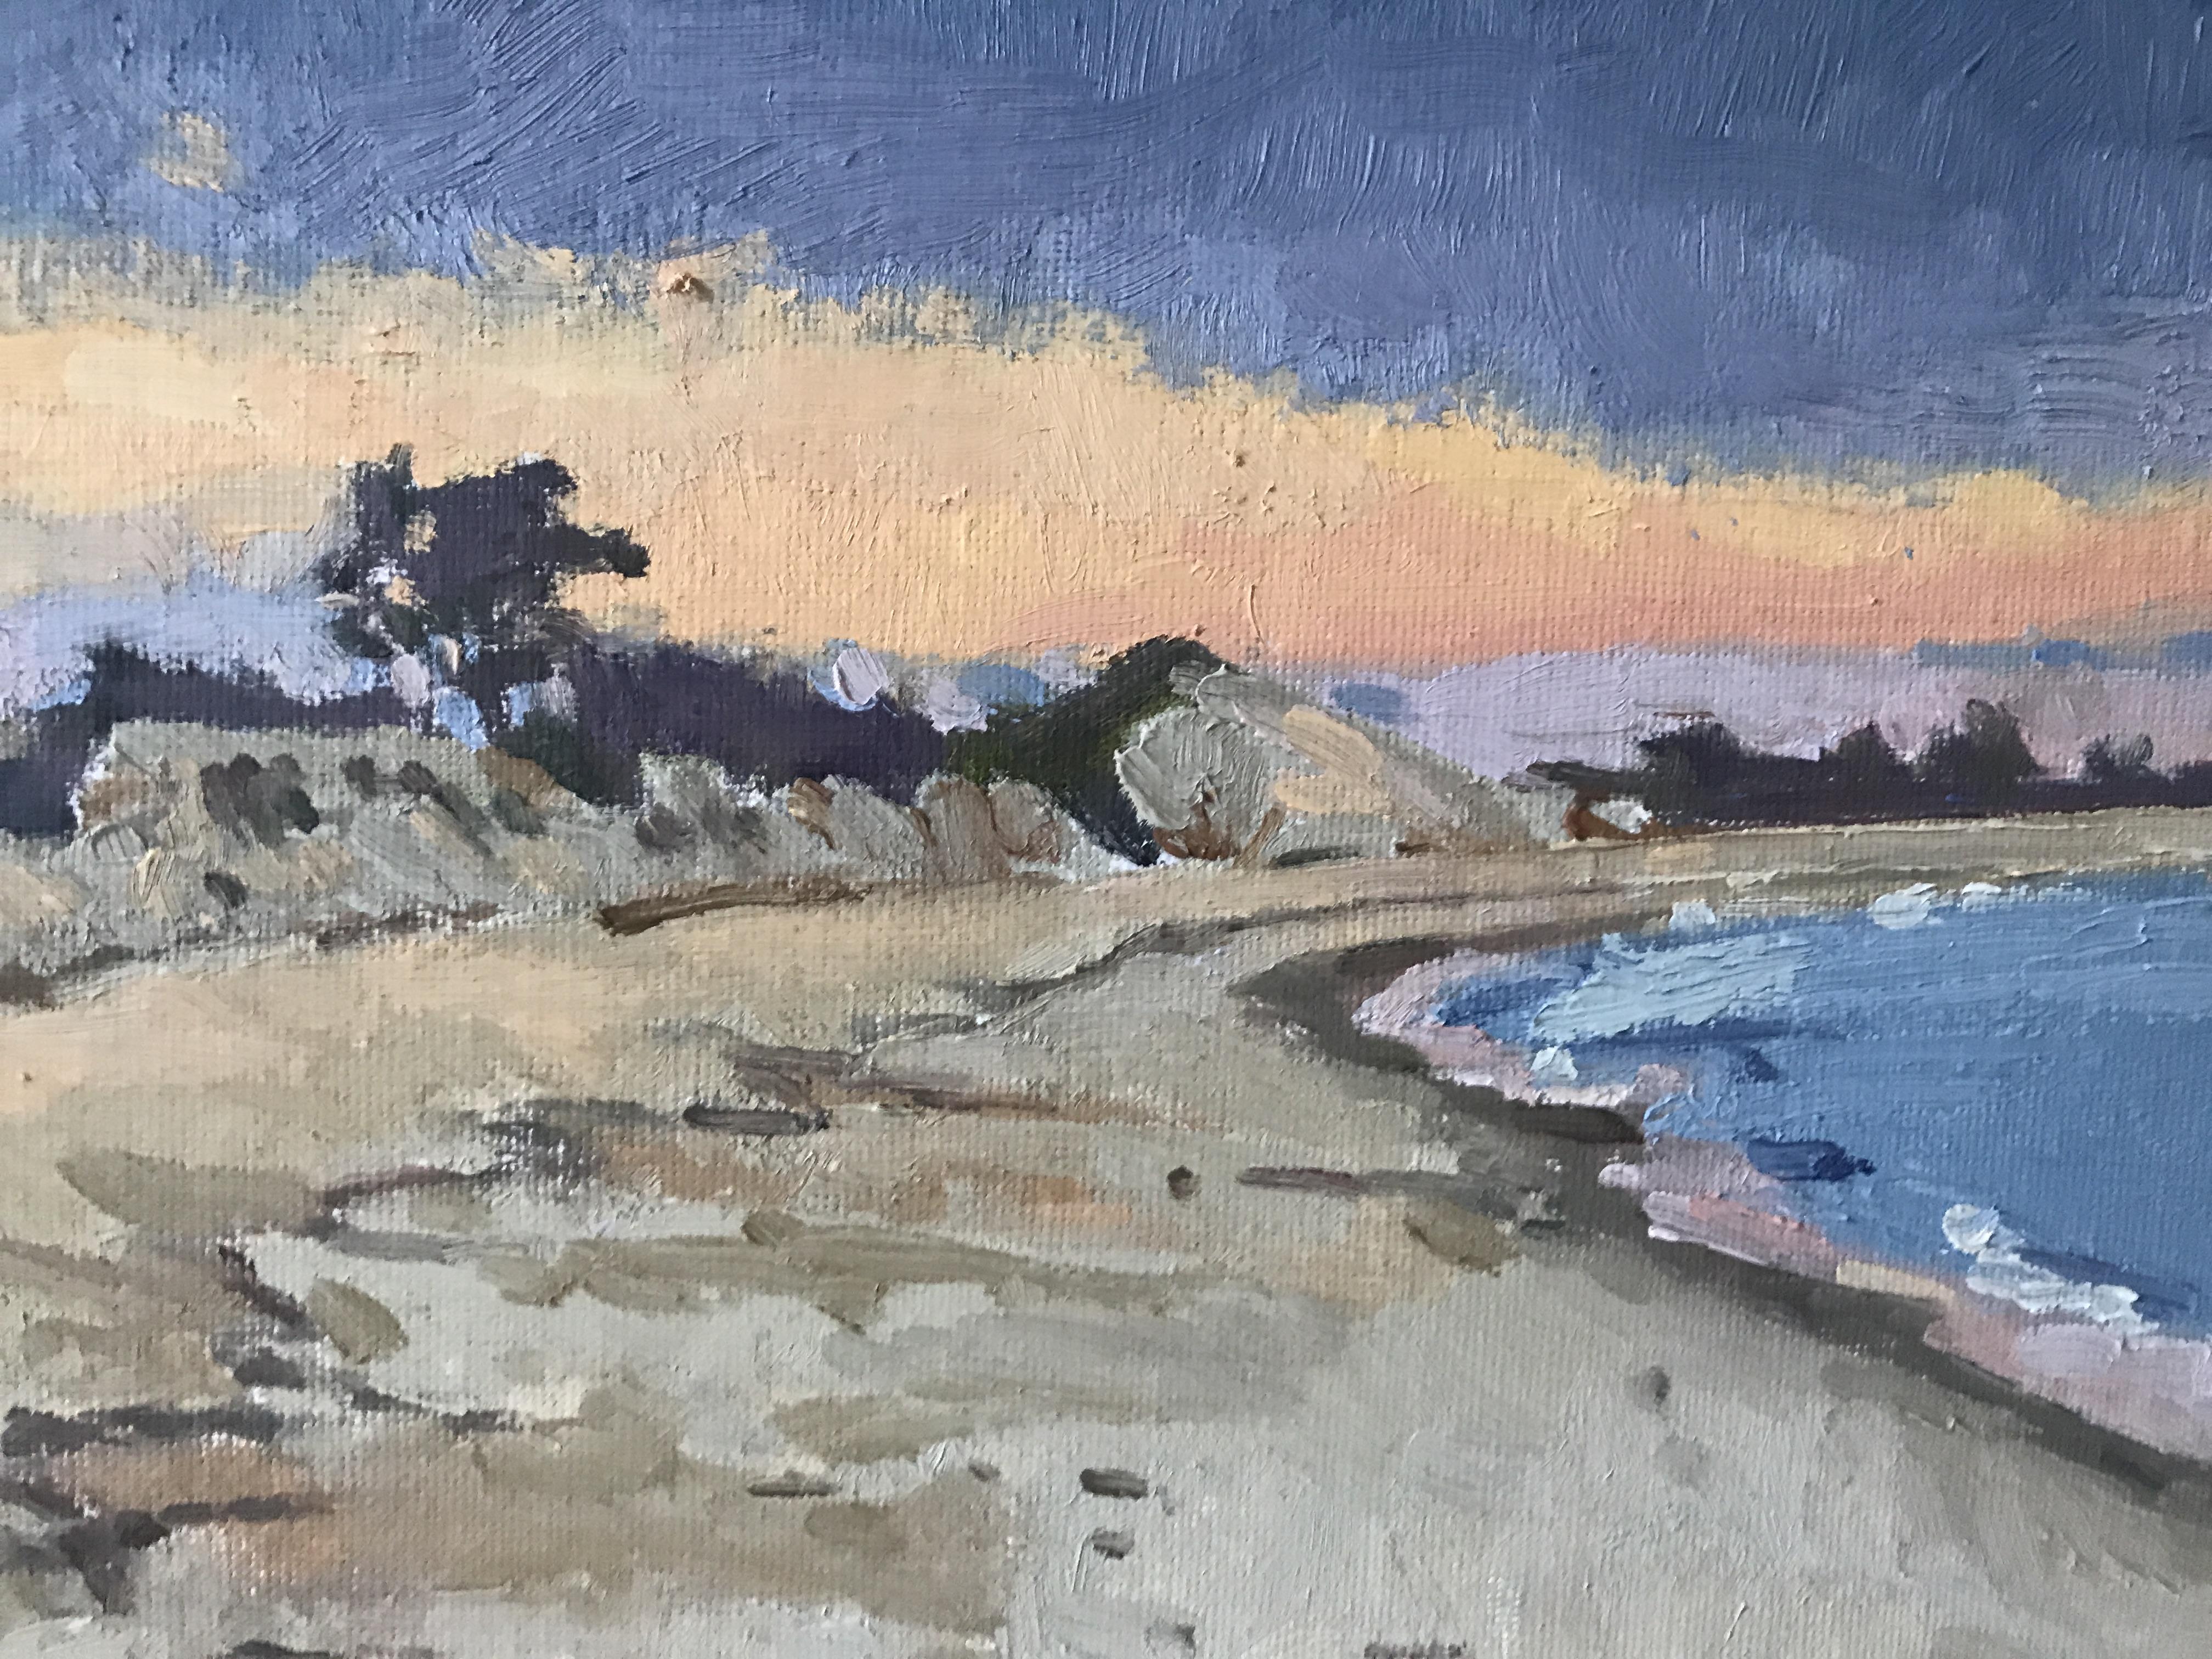 Crane's beach Essex Massachusetts